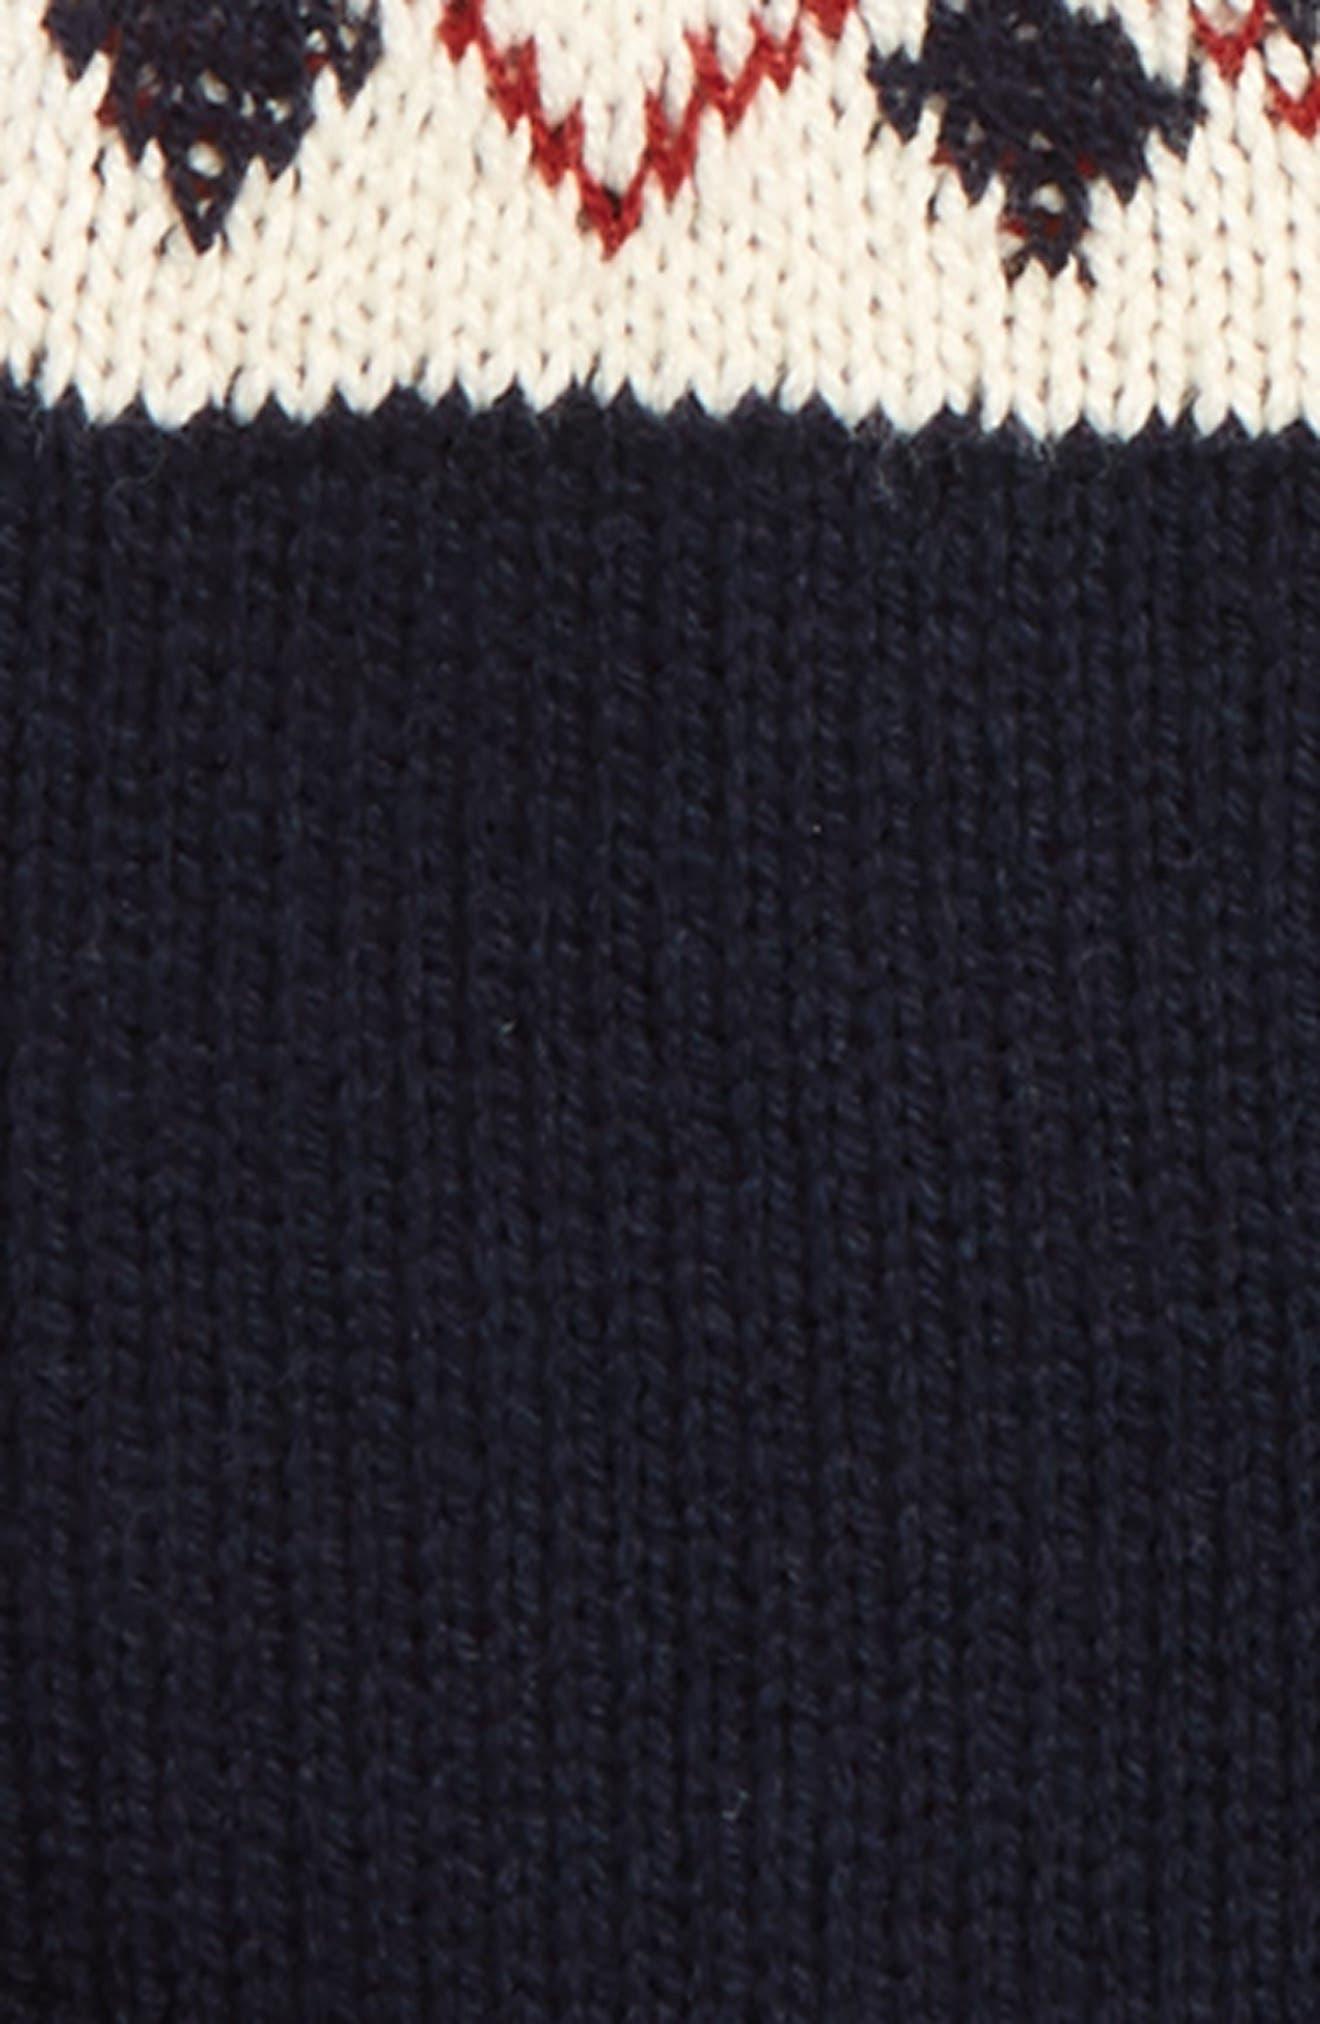 Mackai Pattern Cardigan Sweater,                             Alternate thumbnail 2, color,                             410